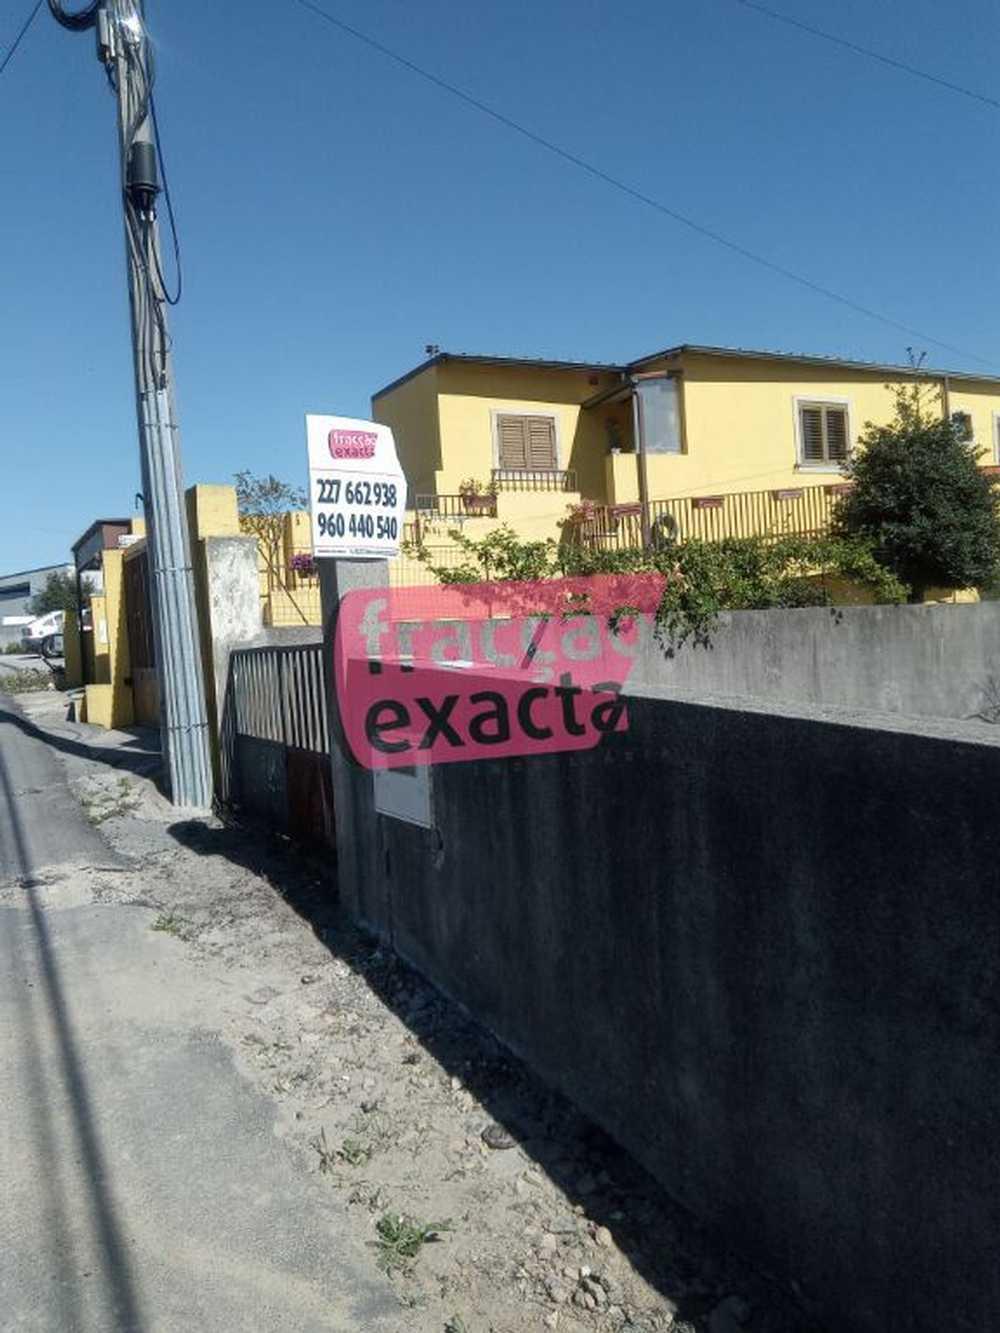 Recarei Paredes 土地 照片 #request.properties.id#